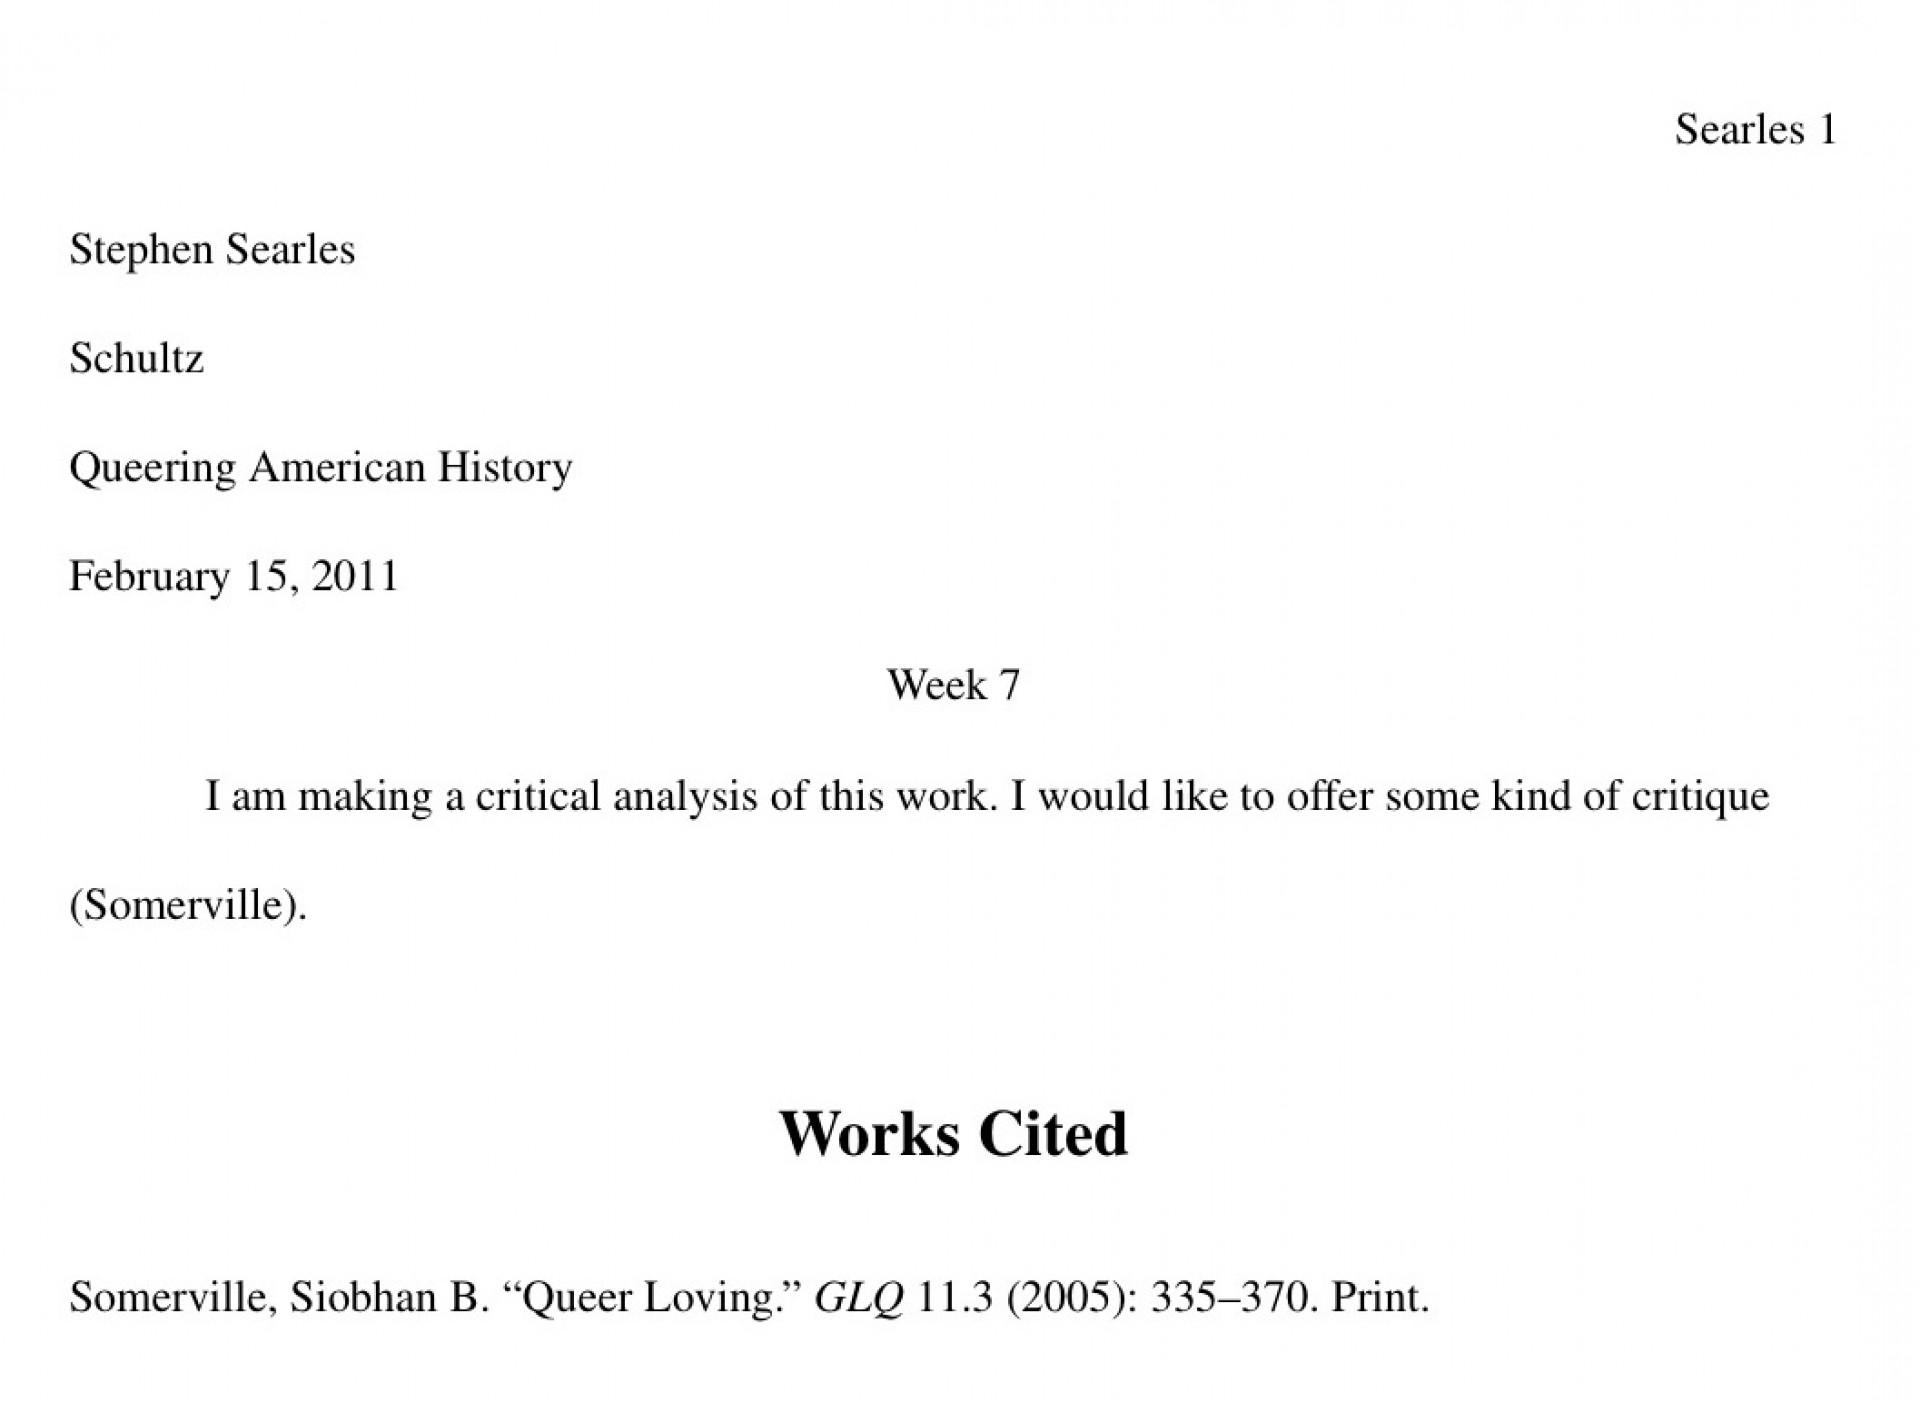 003 Qfw7r Essay Example Header Rare For Application Apa 1920